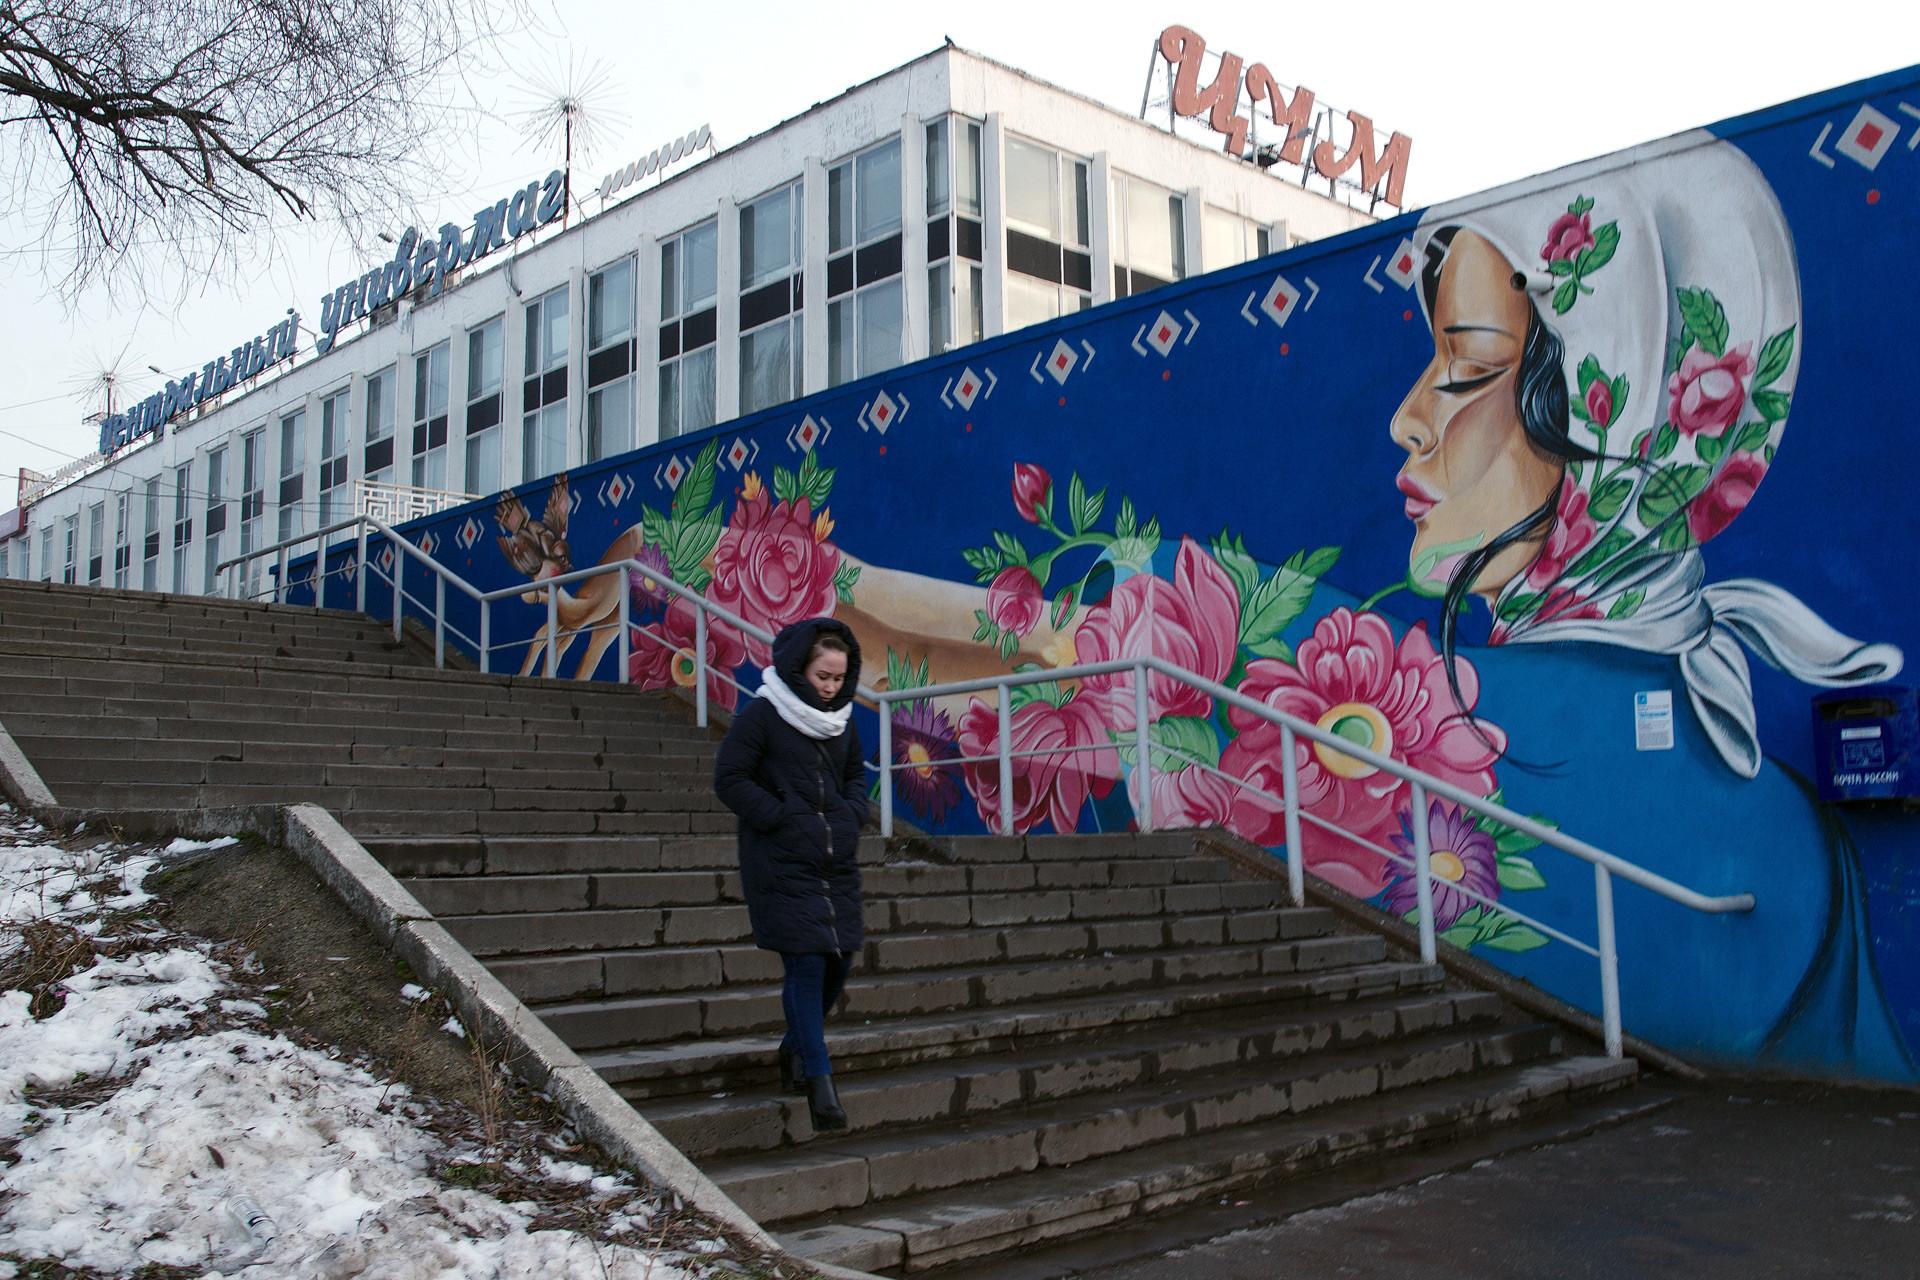 Mural by Nanibah Chacon in Izhevsk